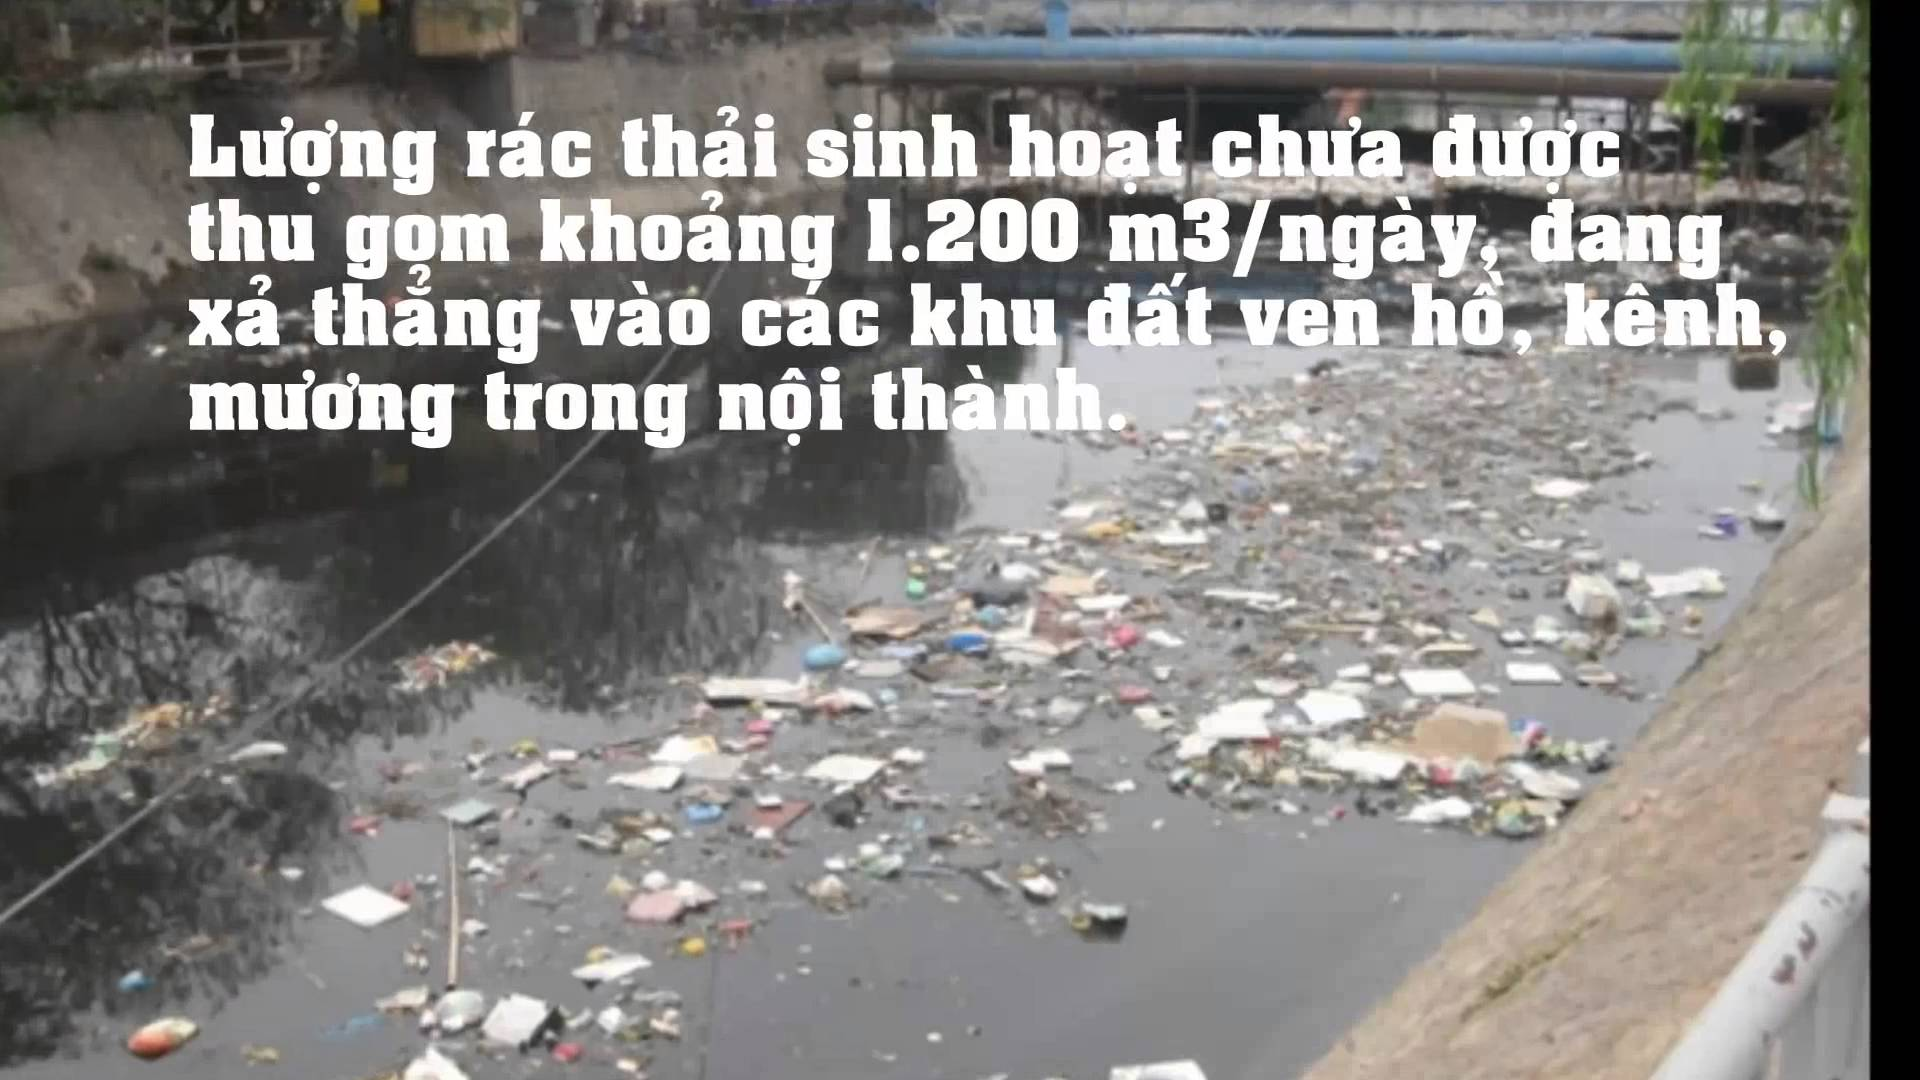 quy-trinh-xu-ly-nuoc-thai